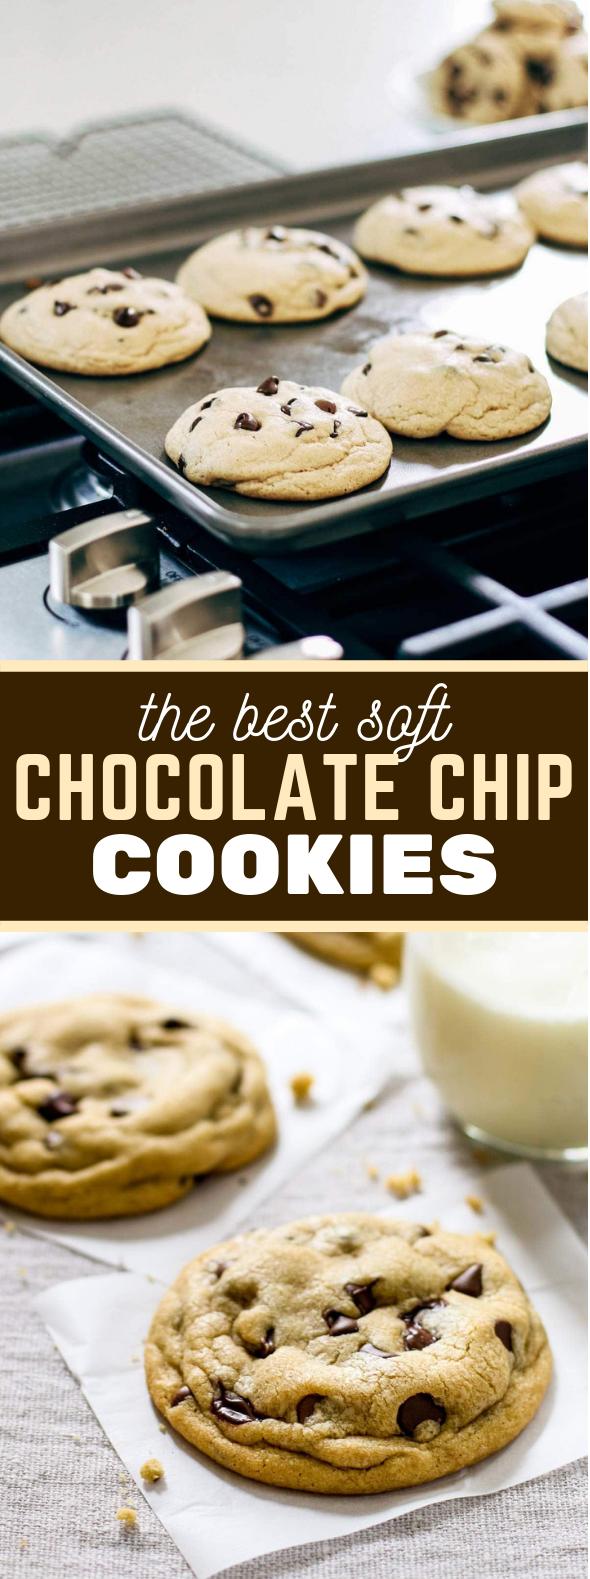 The Best Soft Chocolate Chip Cookies #desserts #milk